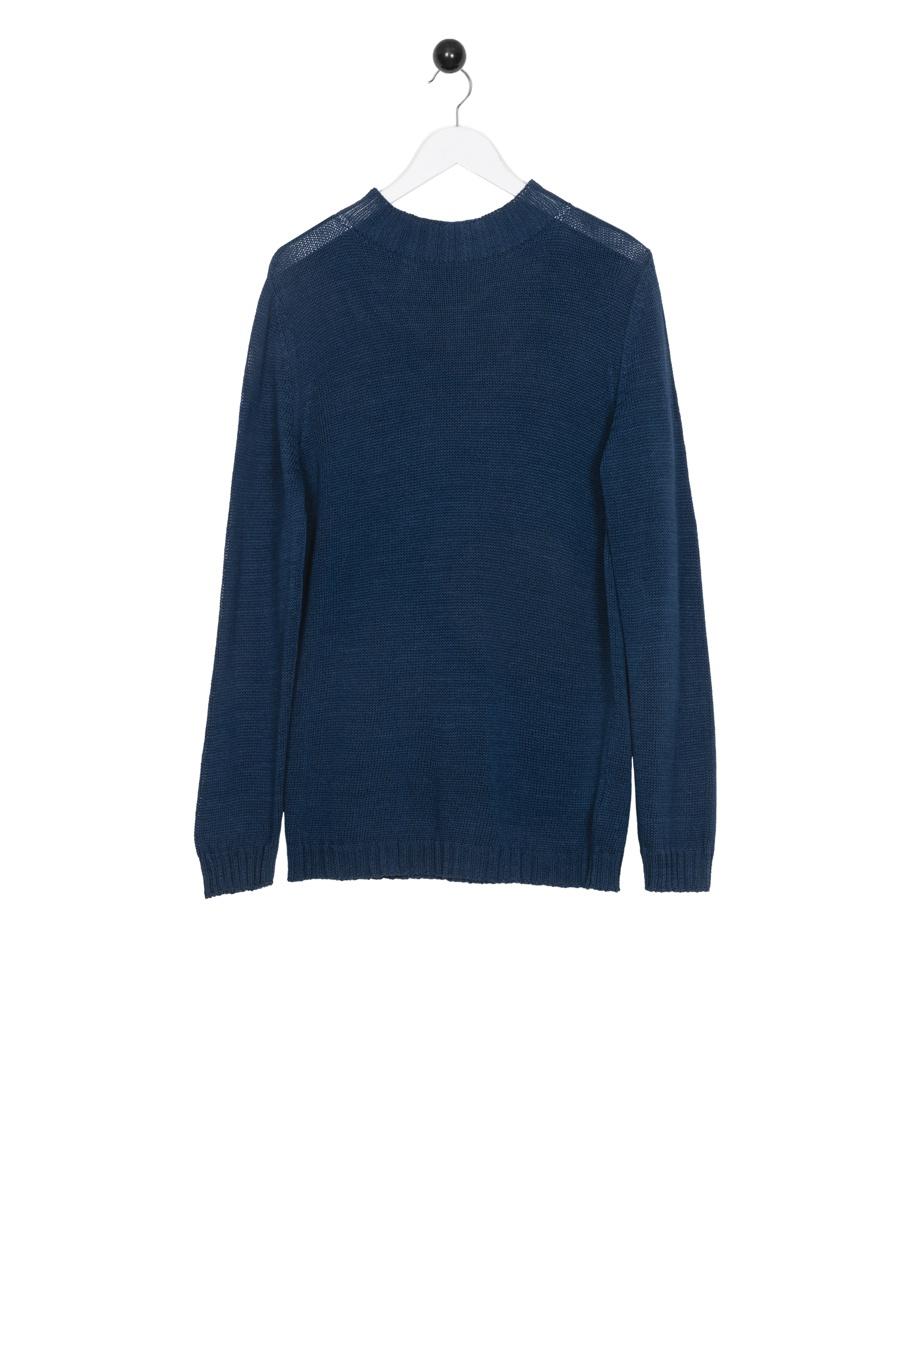 Antibes Sweater